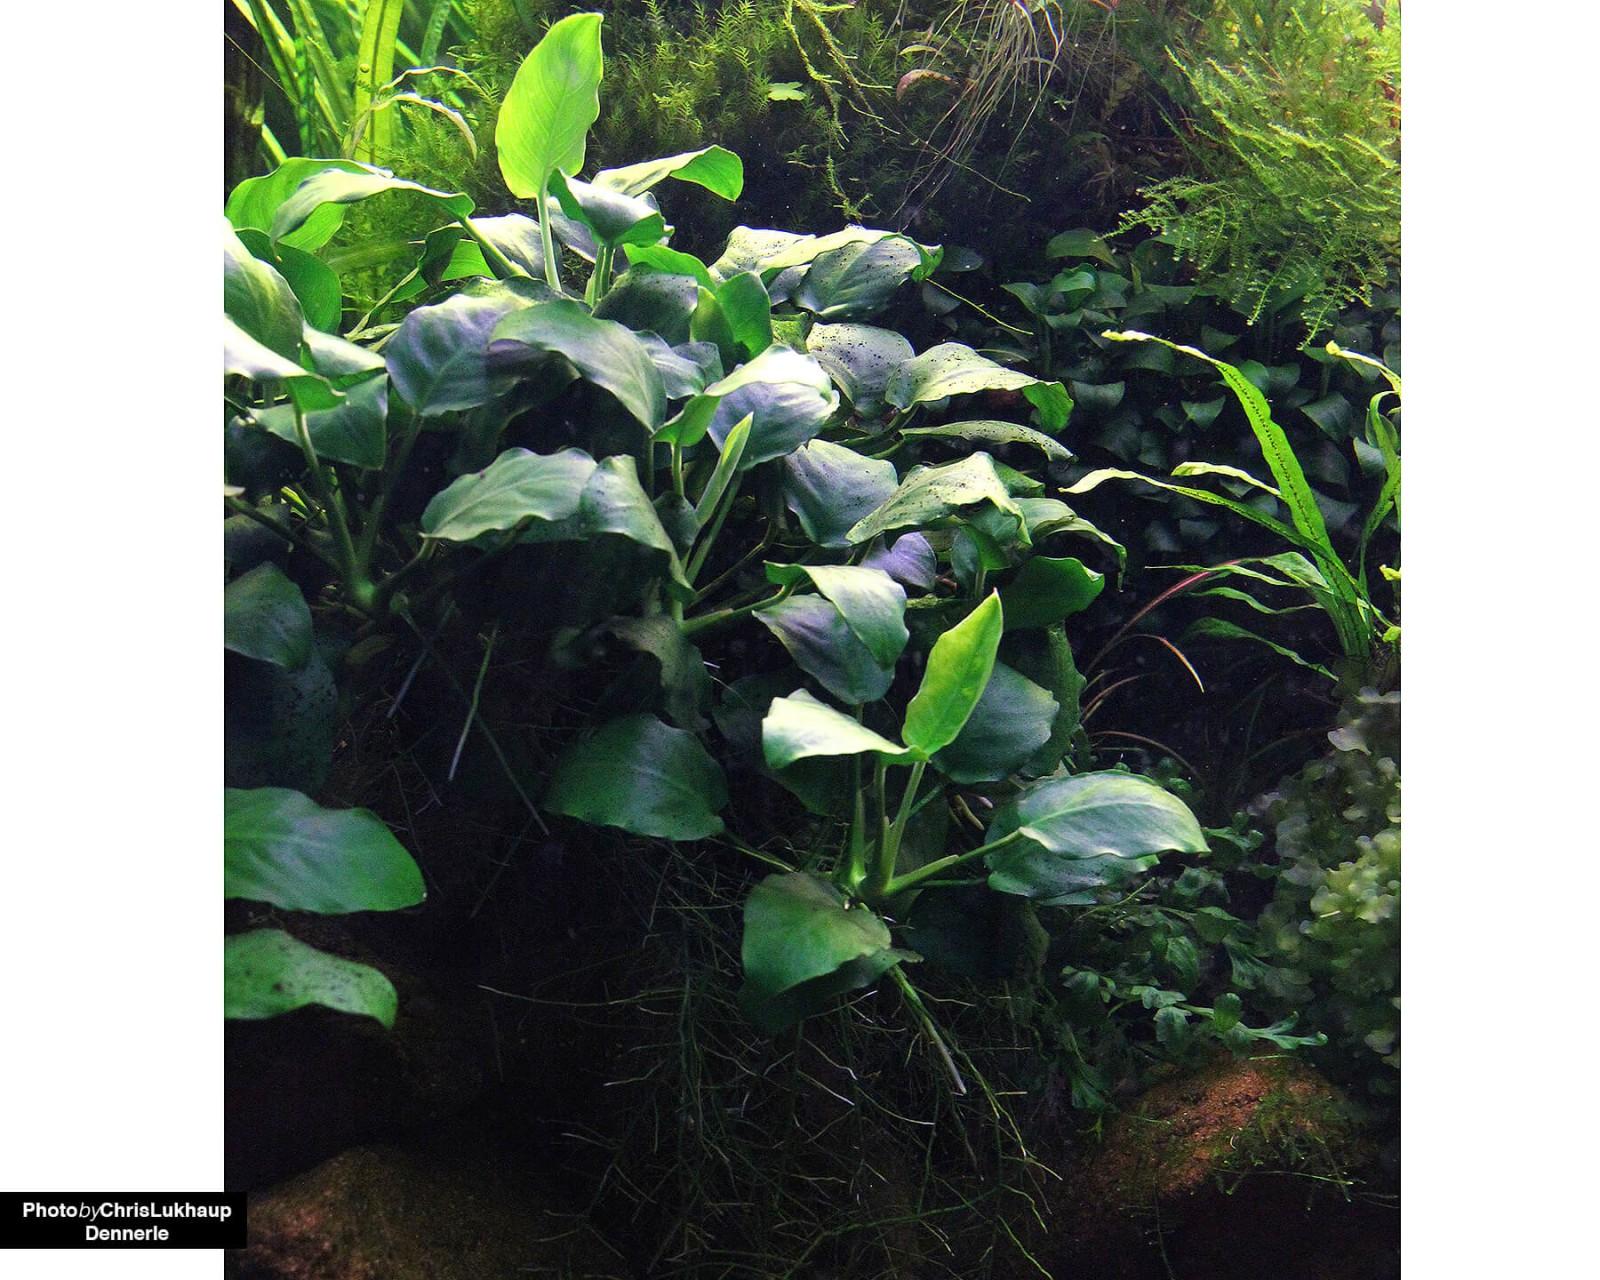 anubias pflanzen im aquarium terrarium arten pflege aquariumpflanzen blog garnelen. Black Bedroom Furniture Sets. Home Design Ideas